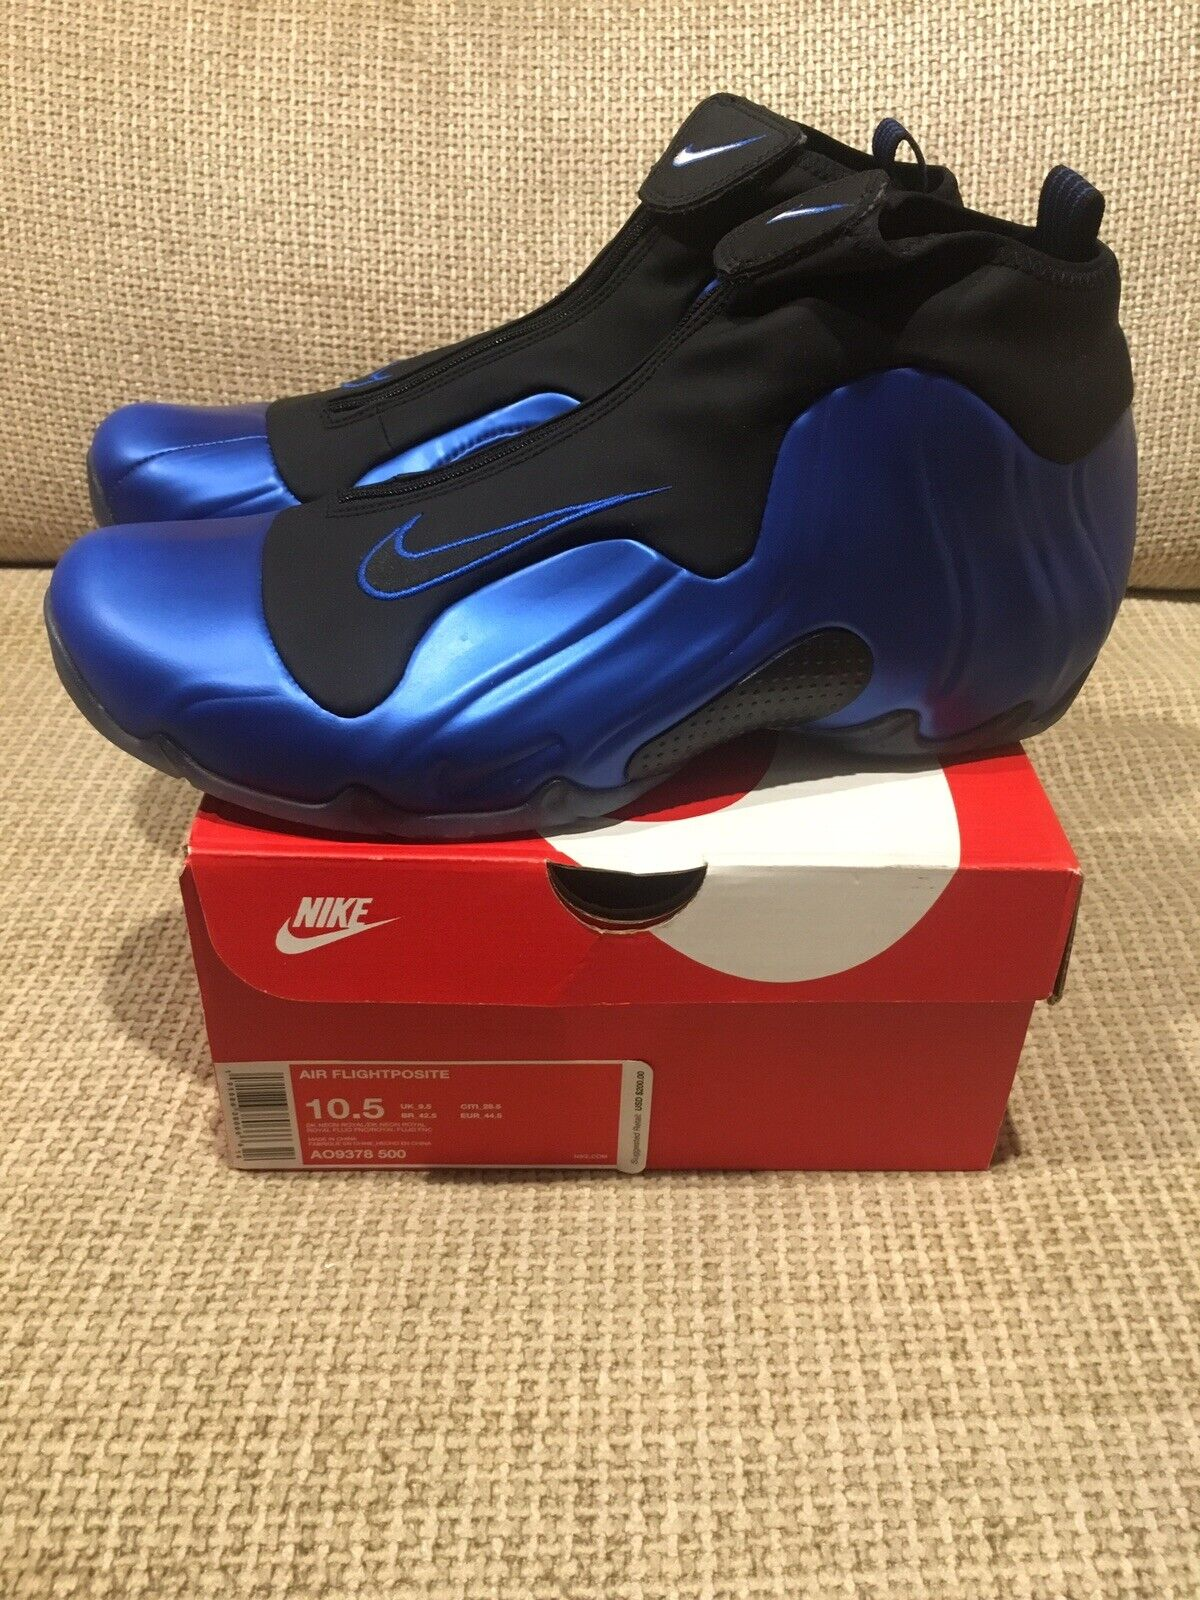 Nike Air Flightposite Dark Neon Royal blu AO9378  -500 Mens 10.5 Penny Hardaway  l'intera rete più bassa